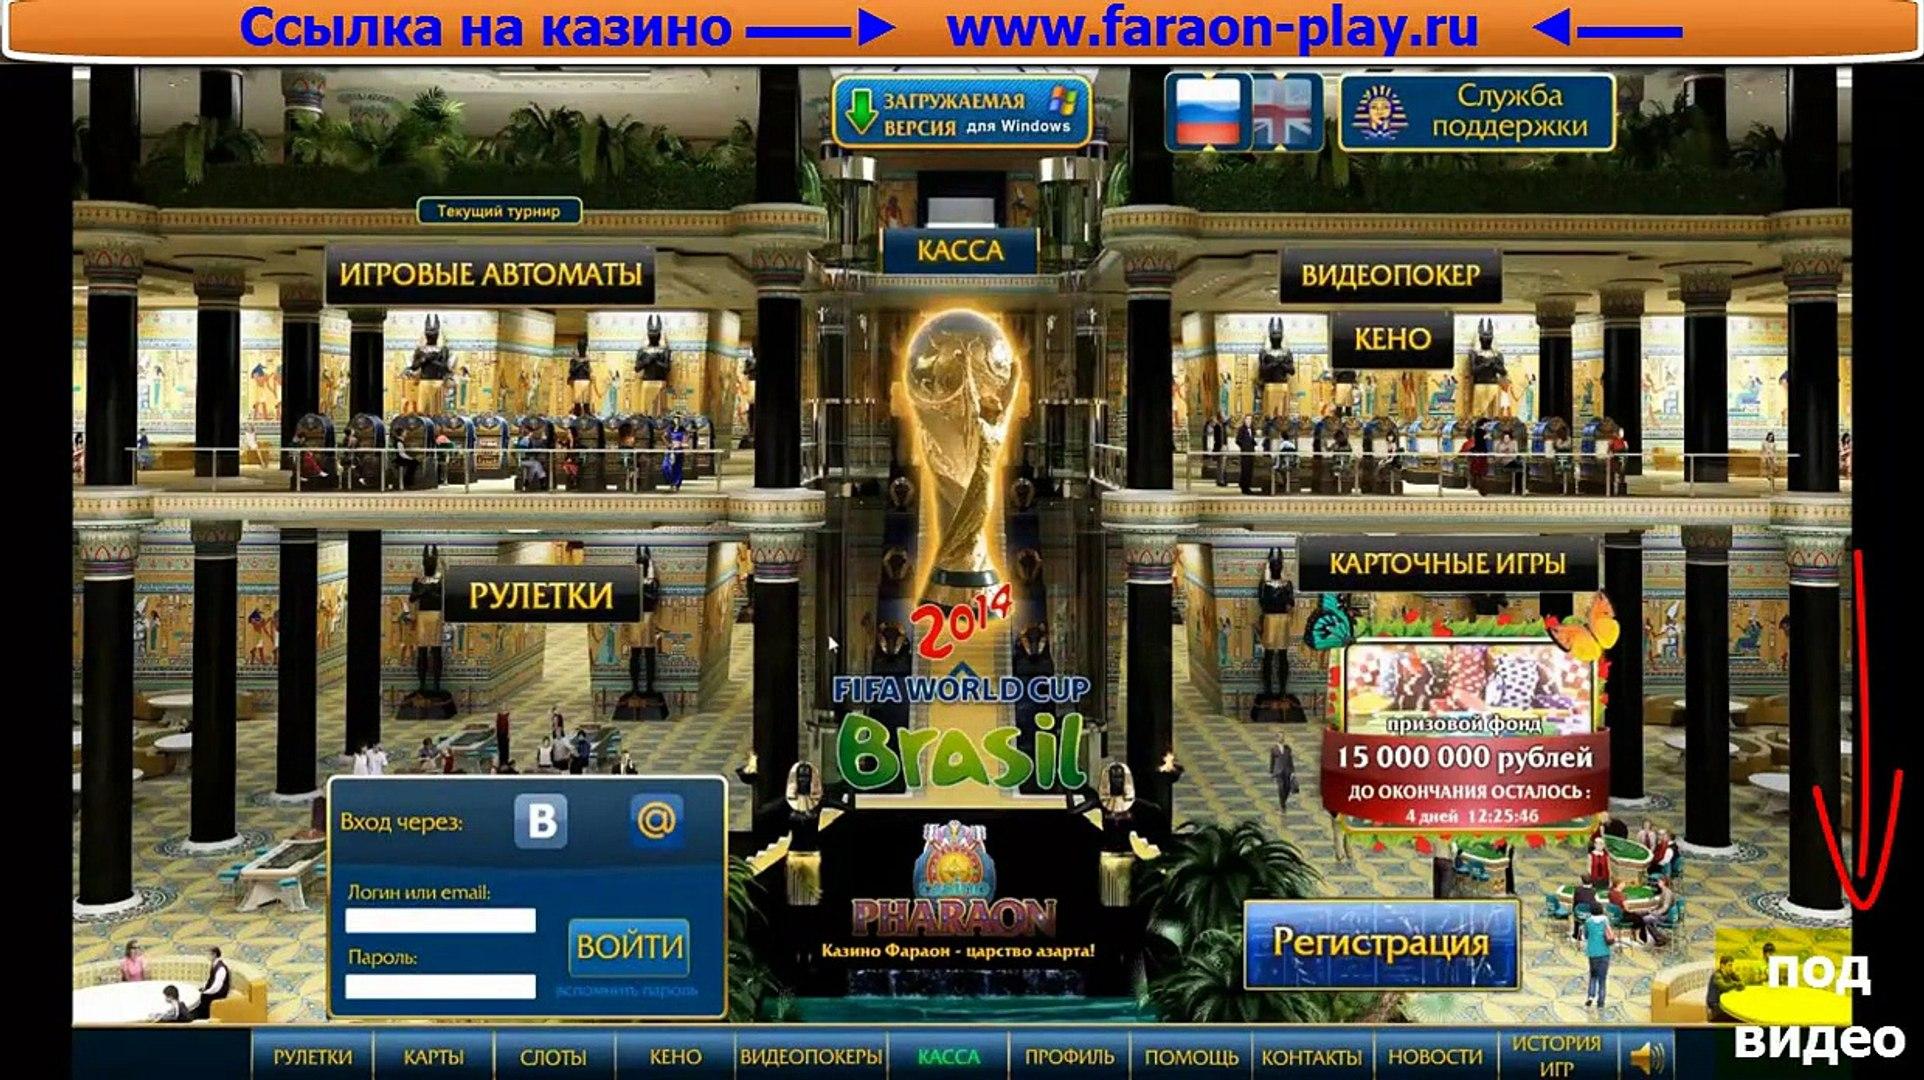 Казино фараон царство азарта игра рулетка играть онлайн